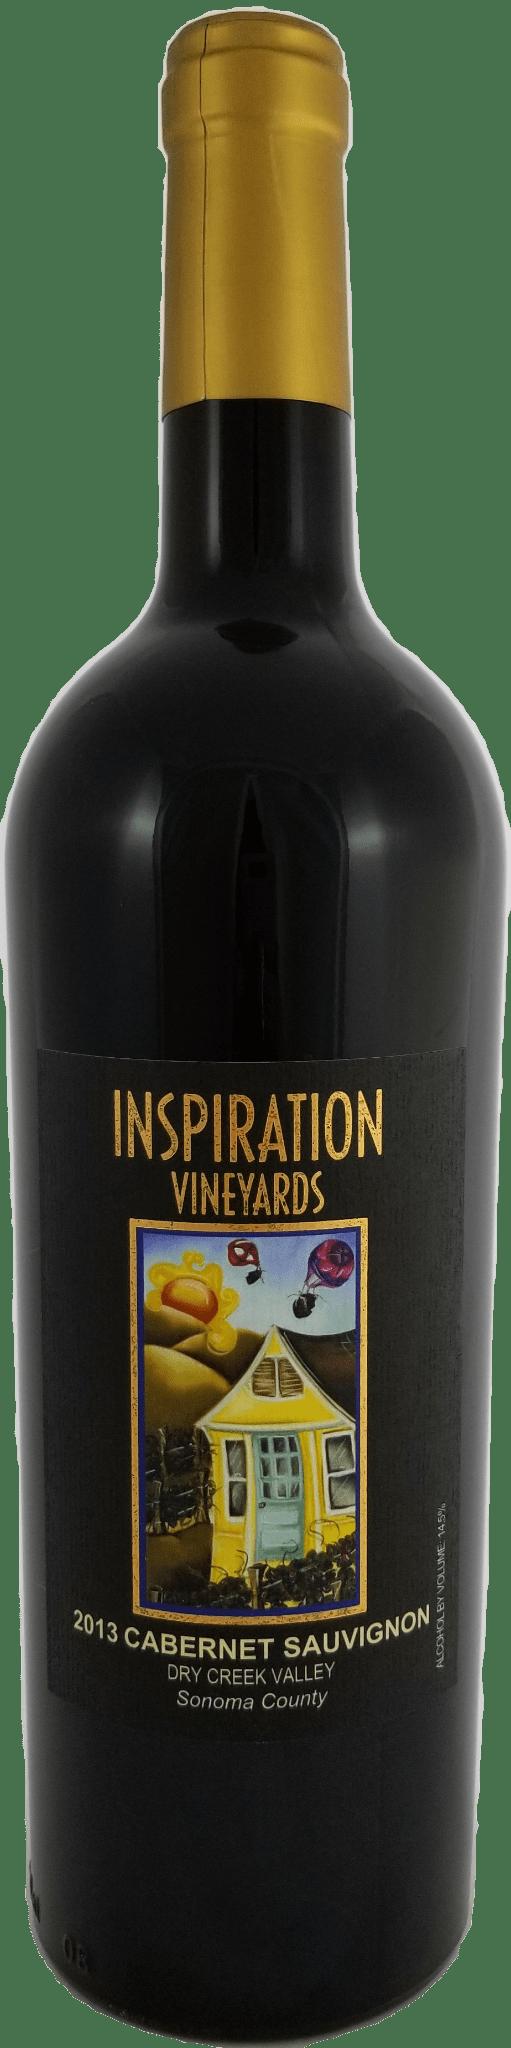 inspiration-13cab-bottle1-1-1-1